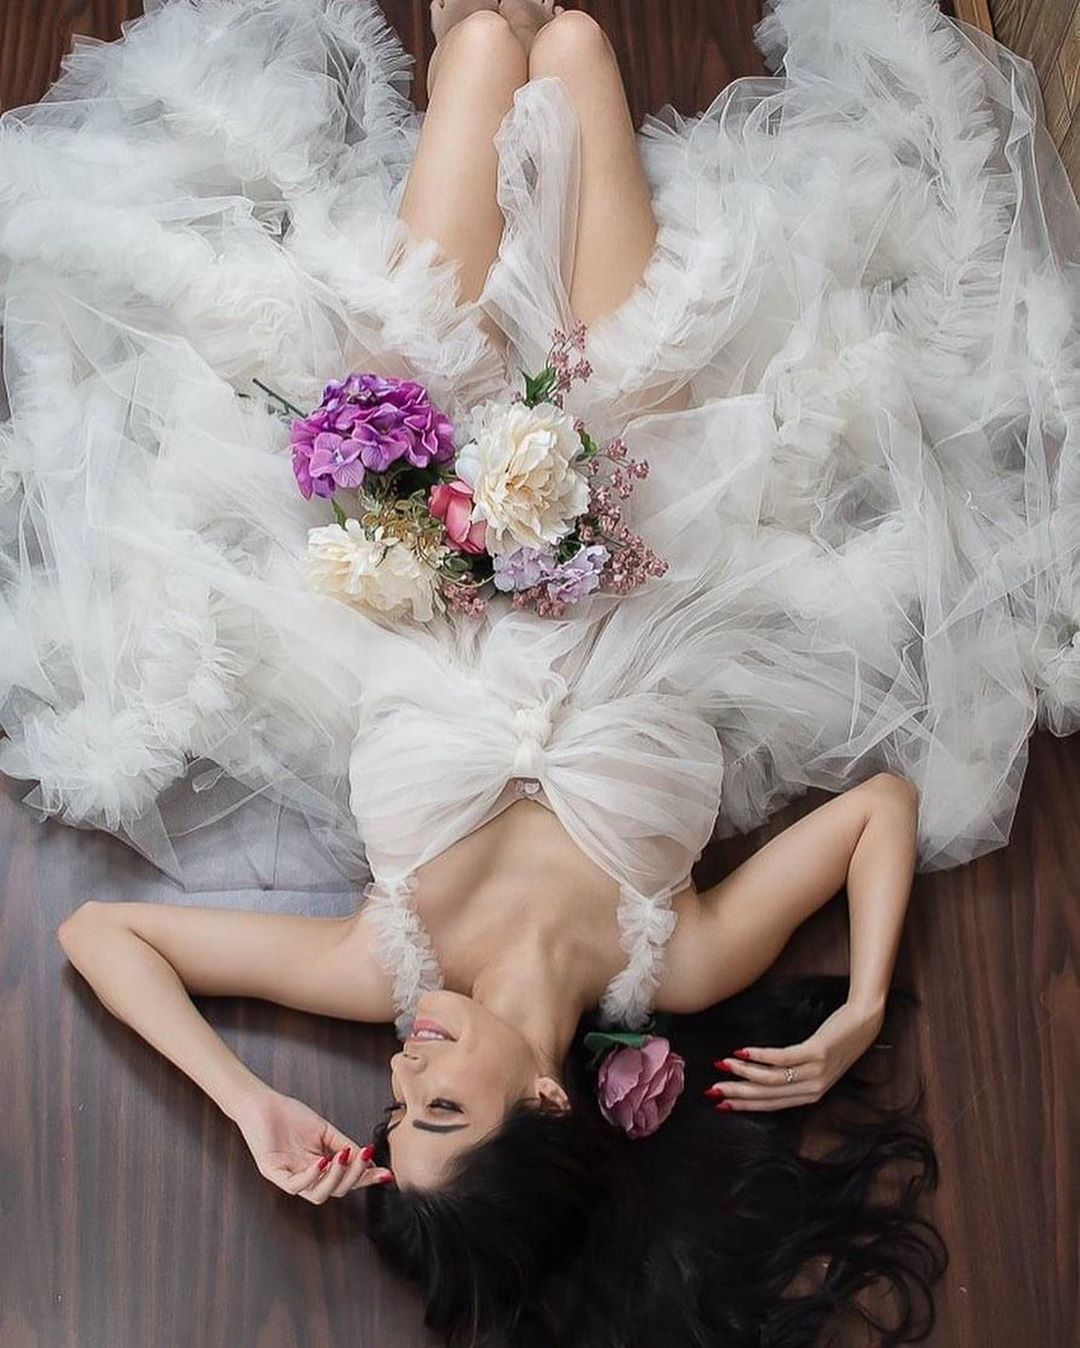 angela leon yuriar, miss grand mexico 2020. - Página 4 10621610